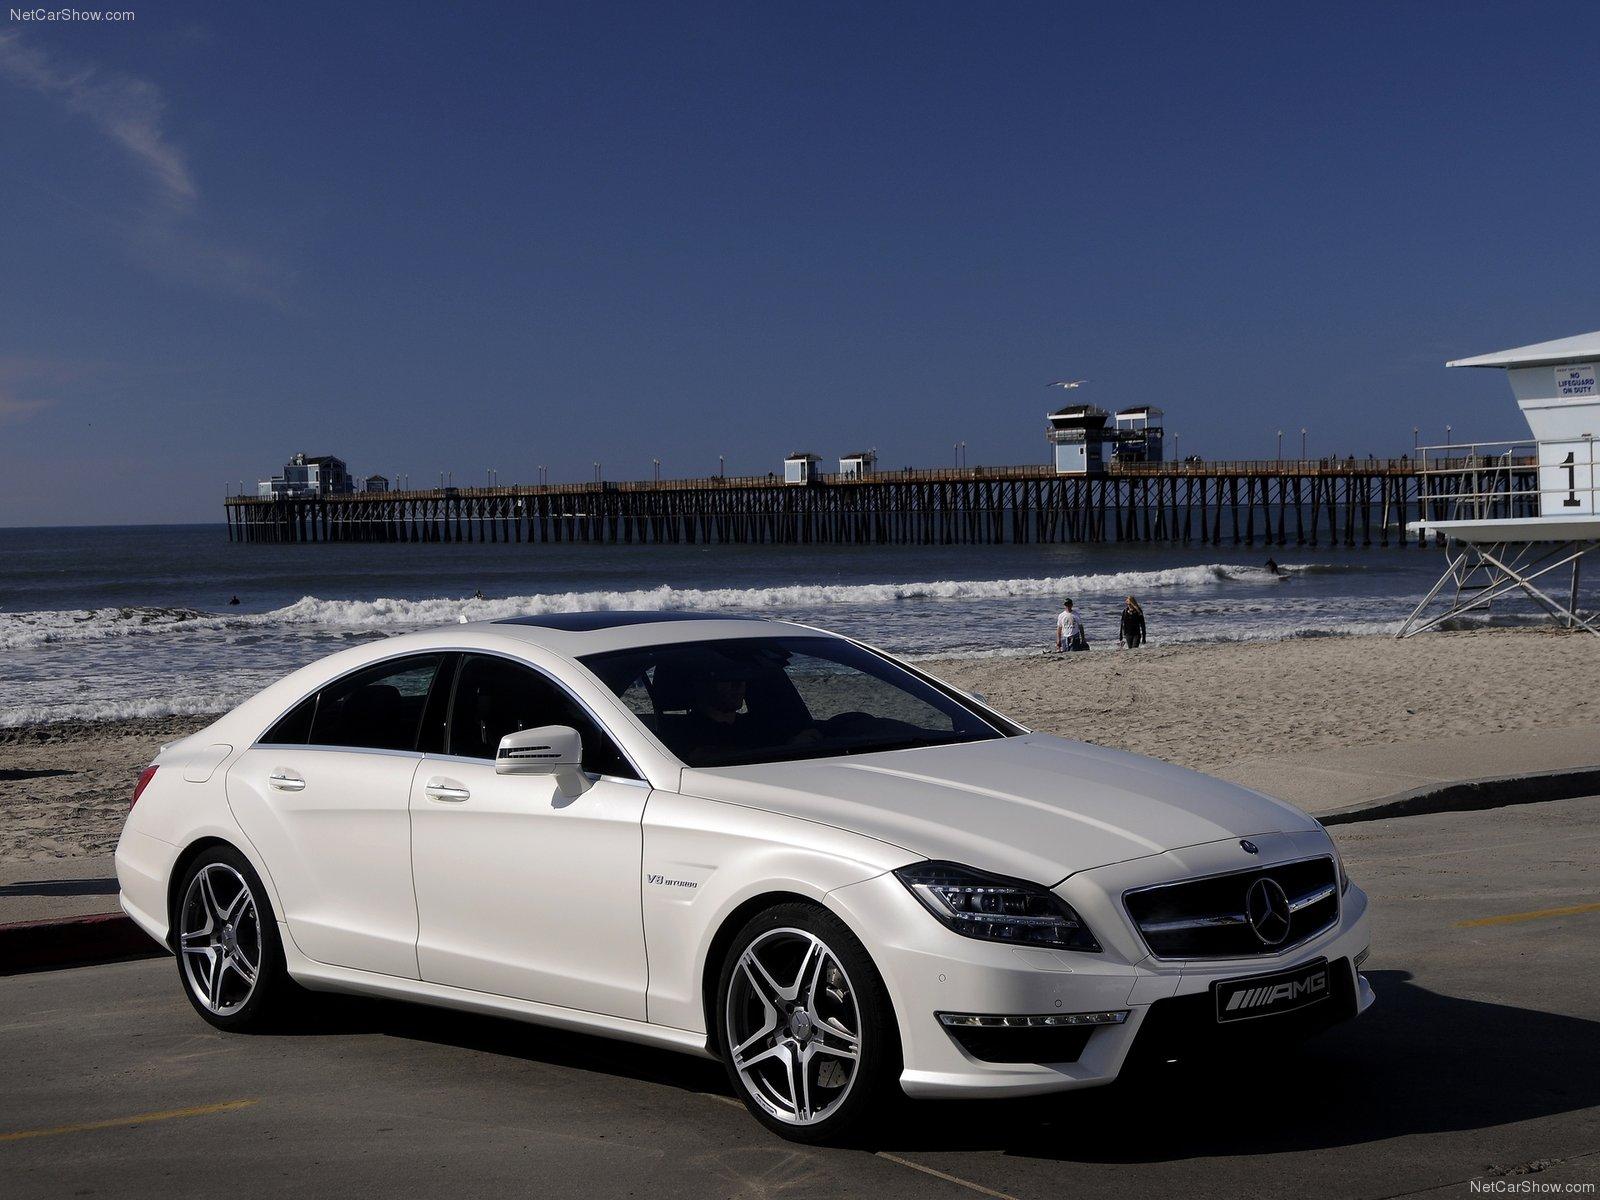 Pic Link: Https://www.carsbase.com/photo/mercedes Benz/mercedes Benz Cl63  Amg Mk35 Pic79245